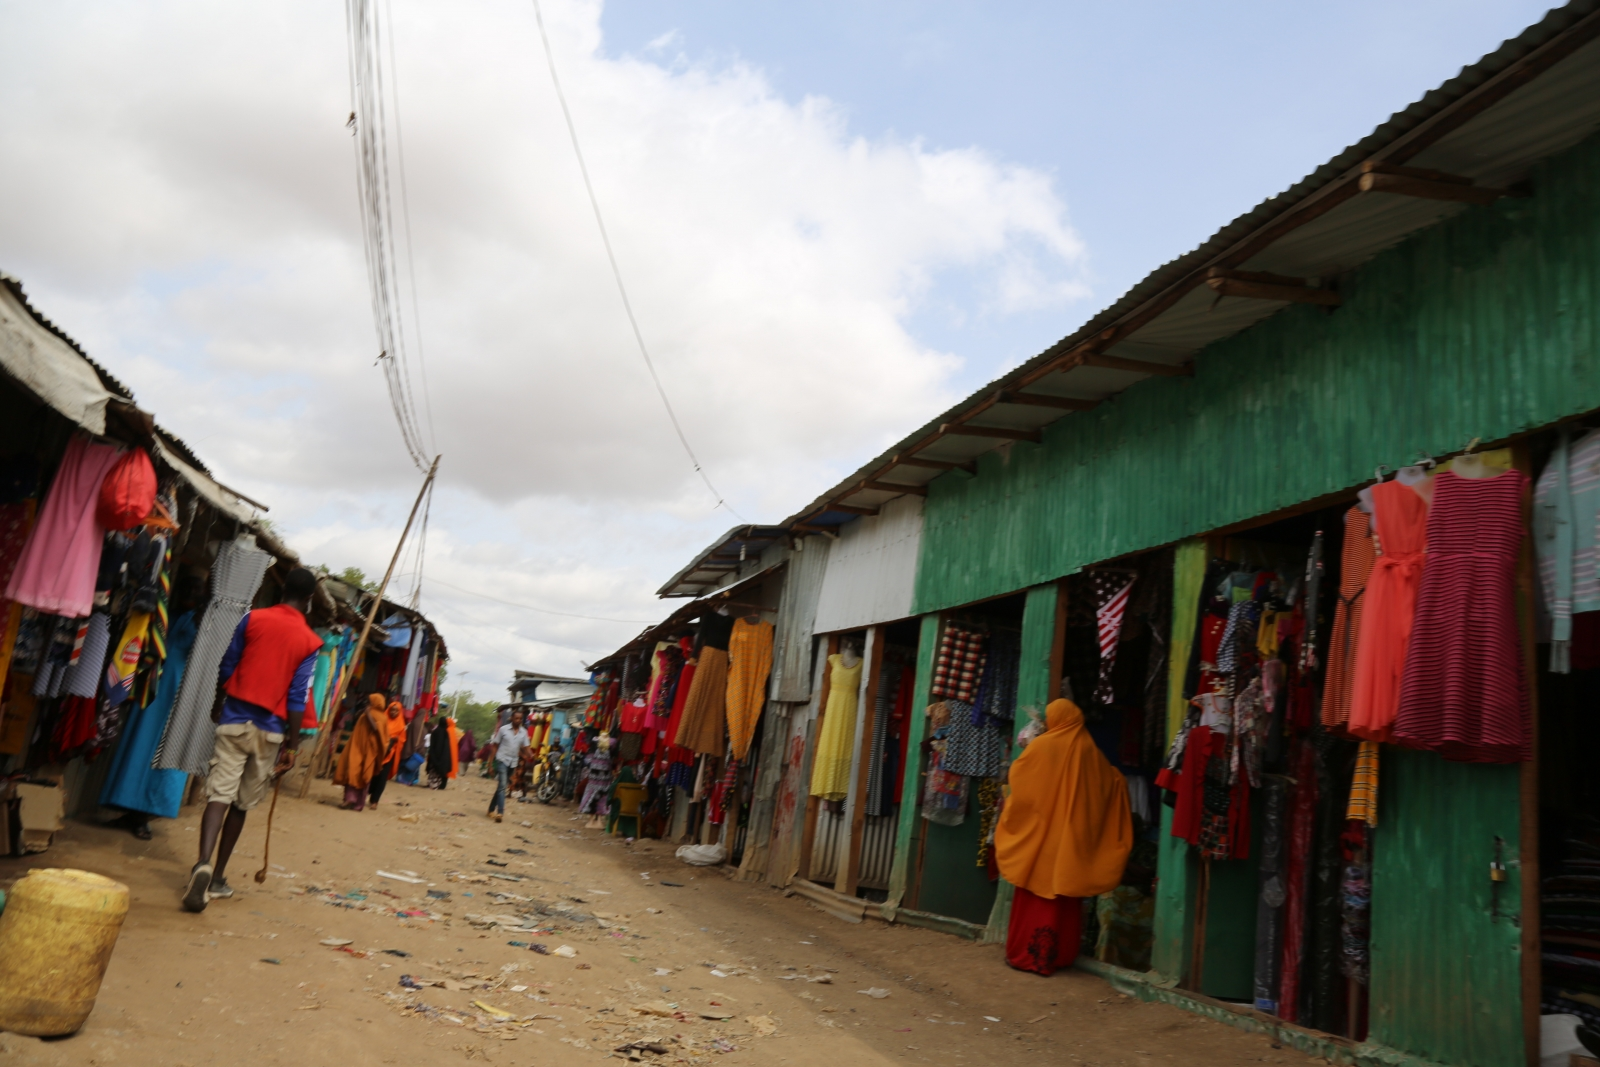 Somali community in Kakuma refugee camp